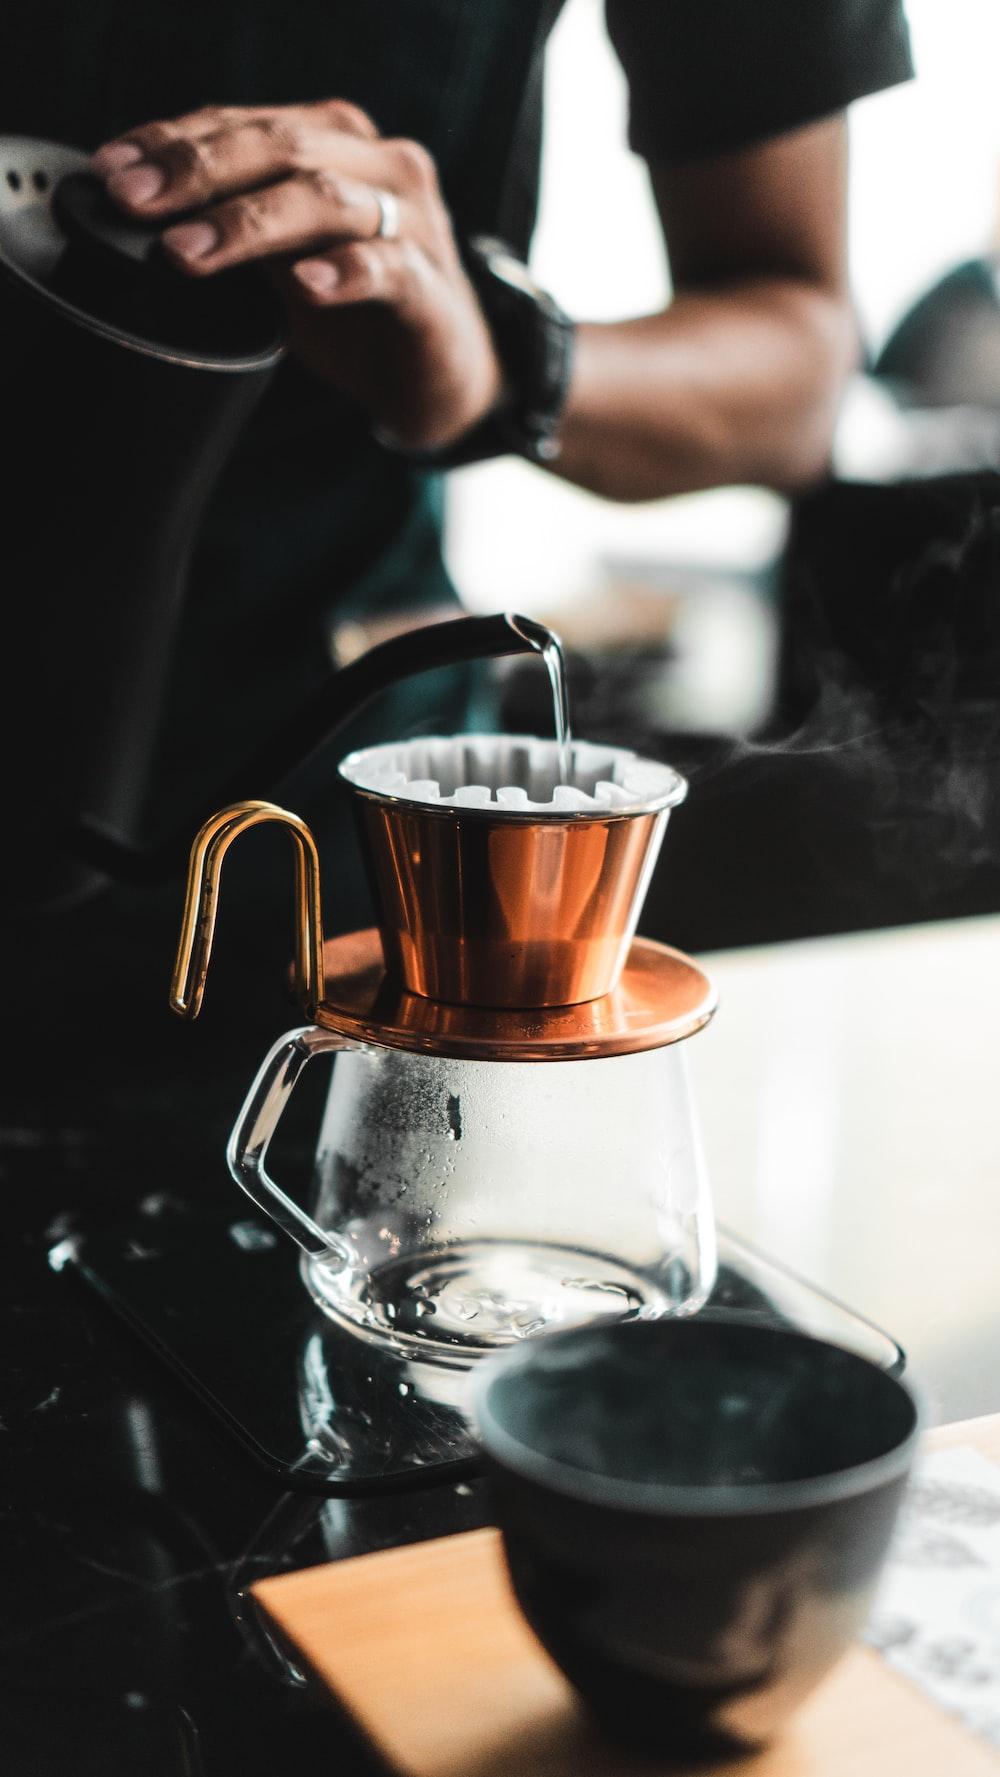 person near coffeemaker